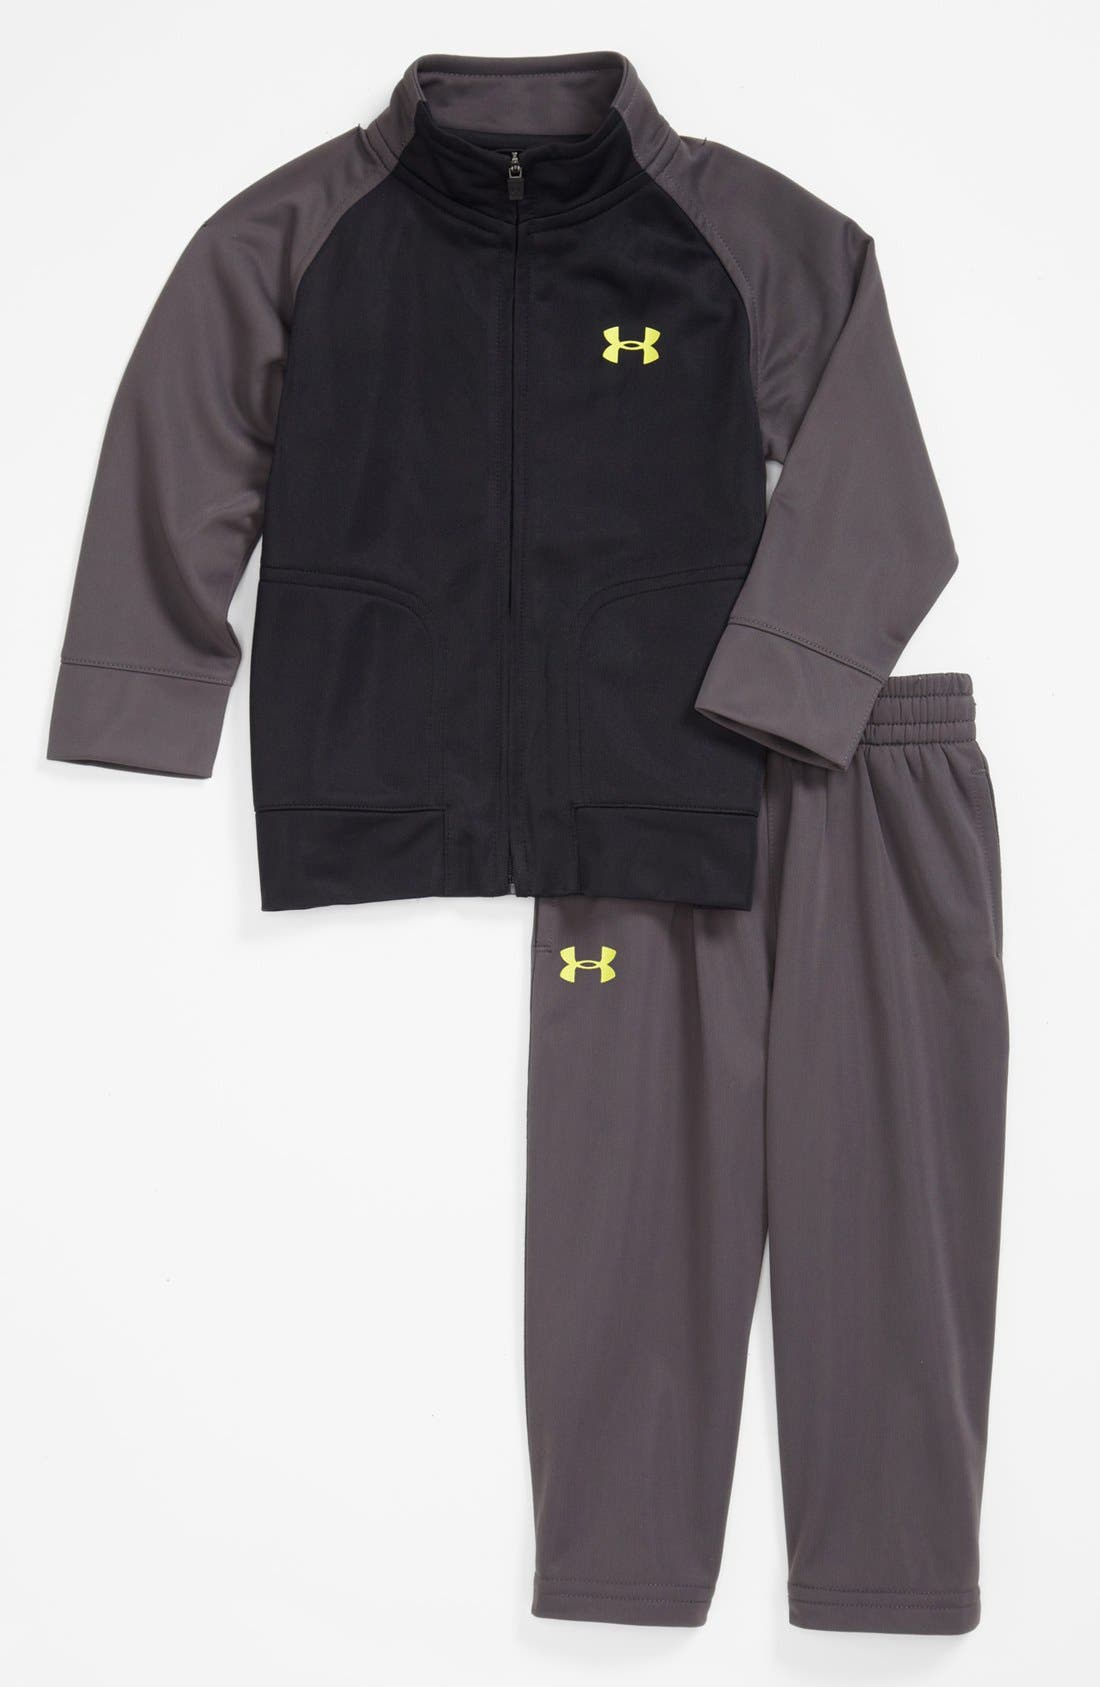 Main Image - Under Armour 'Sideline' Track Jacket & Pants (Baby Boys)